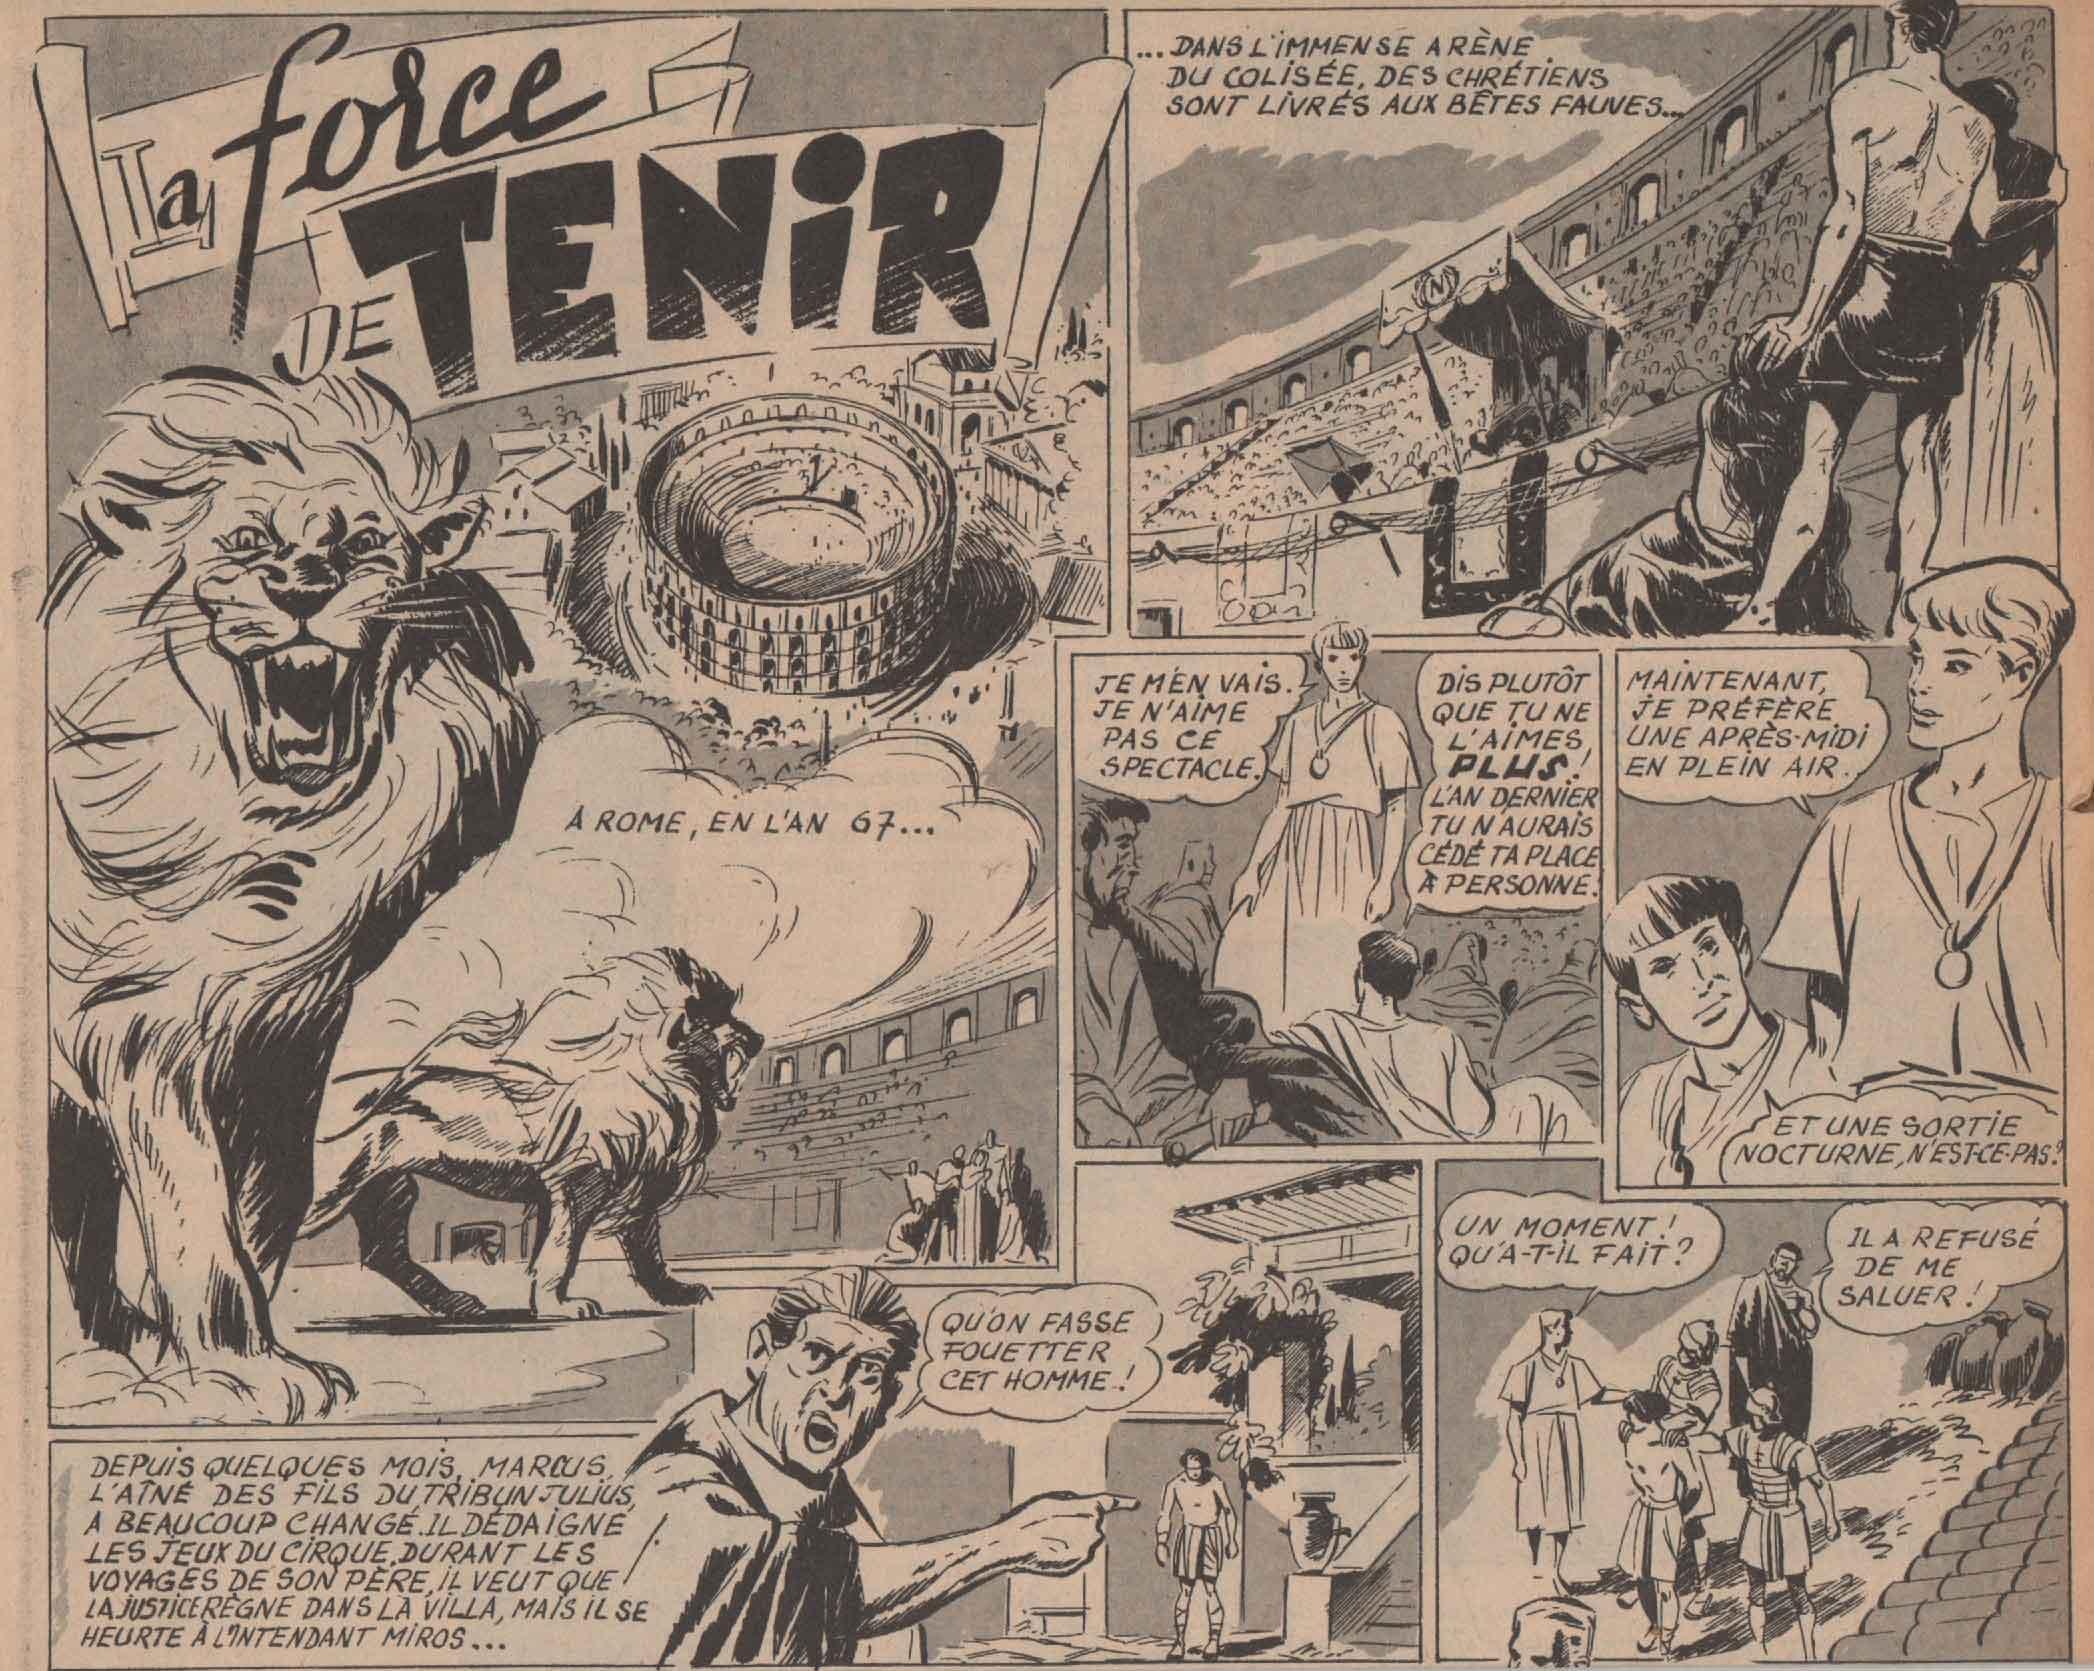 « La Force de tenir » Coeurs vaillants n° 15 (11/04/1954).